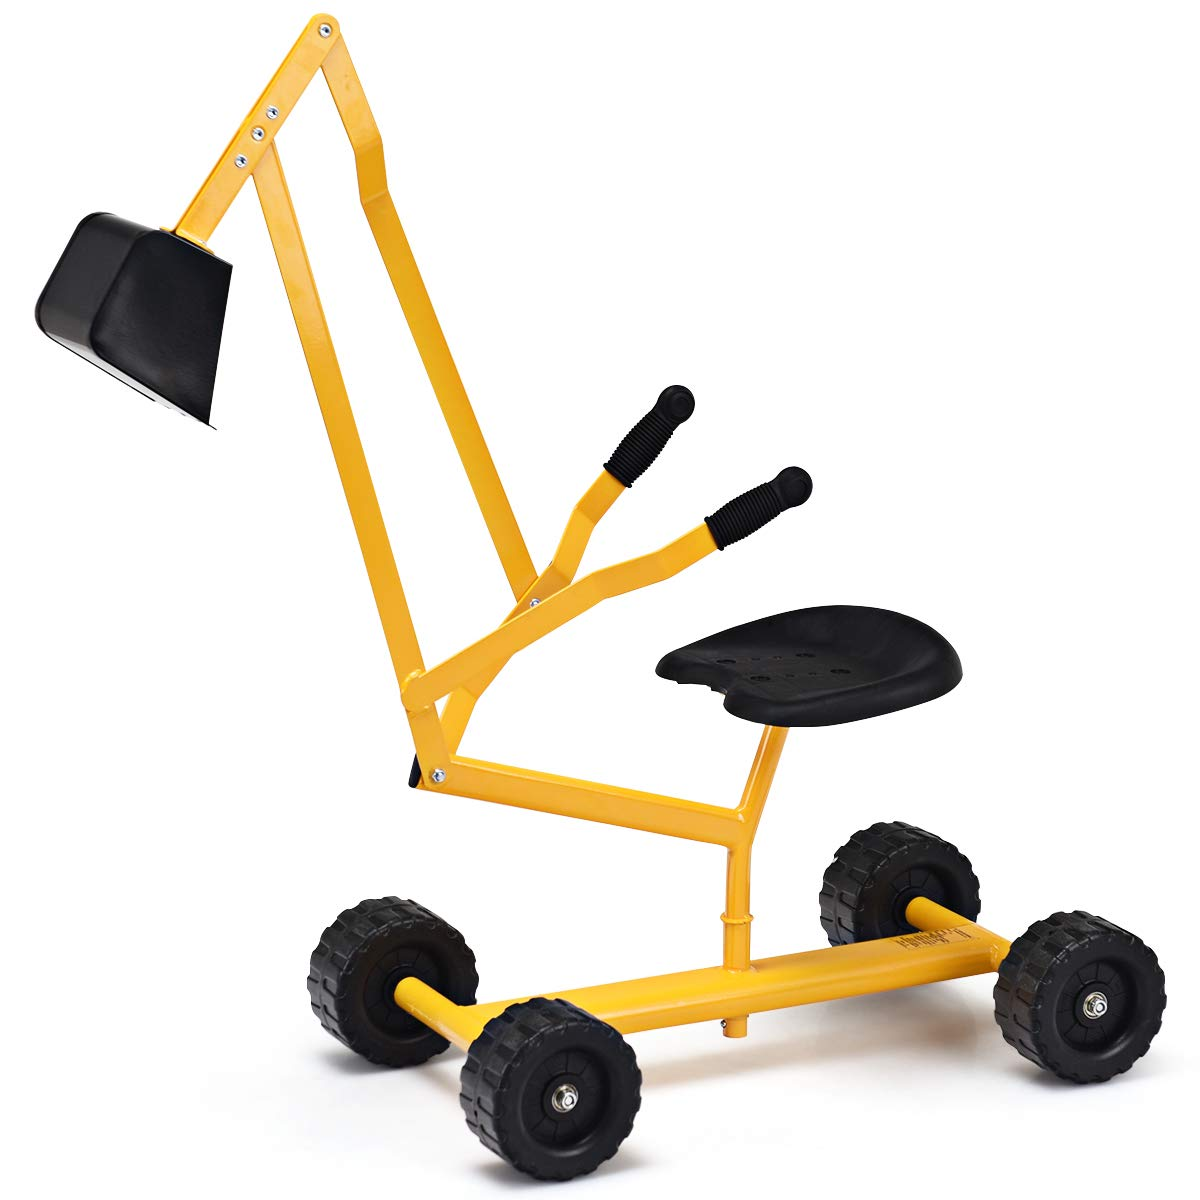 Costzon 8'' Kids Ride-on Sand Digger, Outdoor Sandbox Toy, Heavy Duty Steel Digging Scooper Excavator Crane with 4 Wheels by Costzon (Image #1)